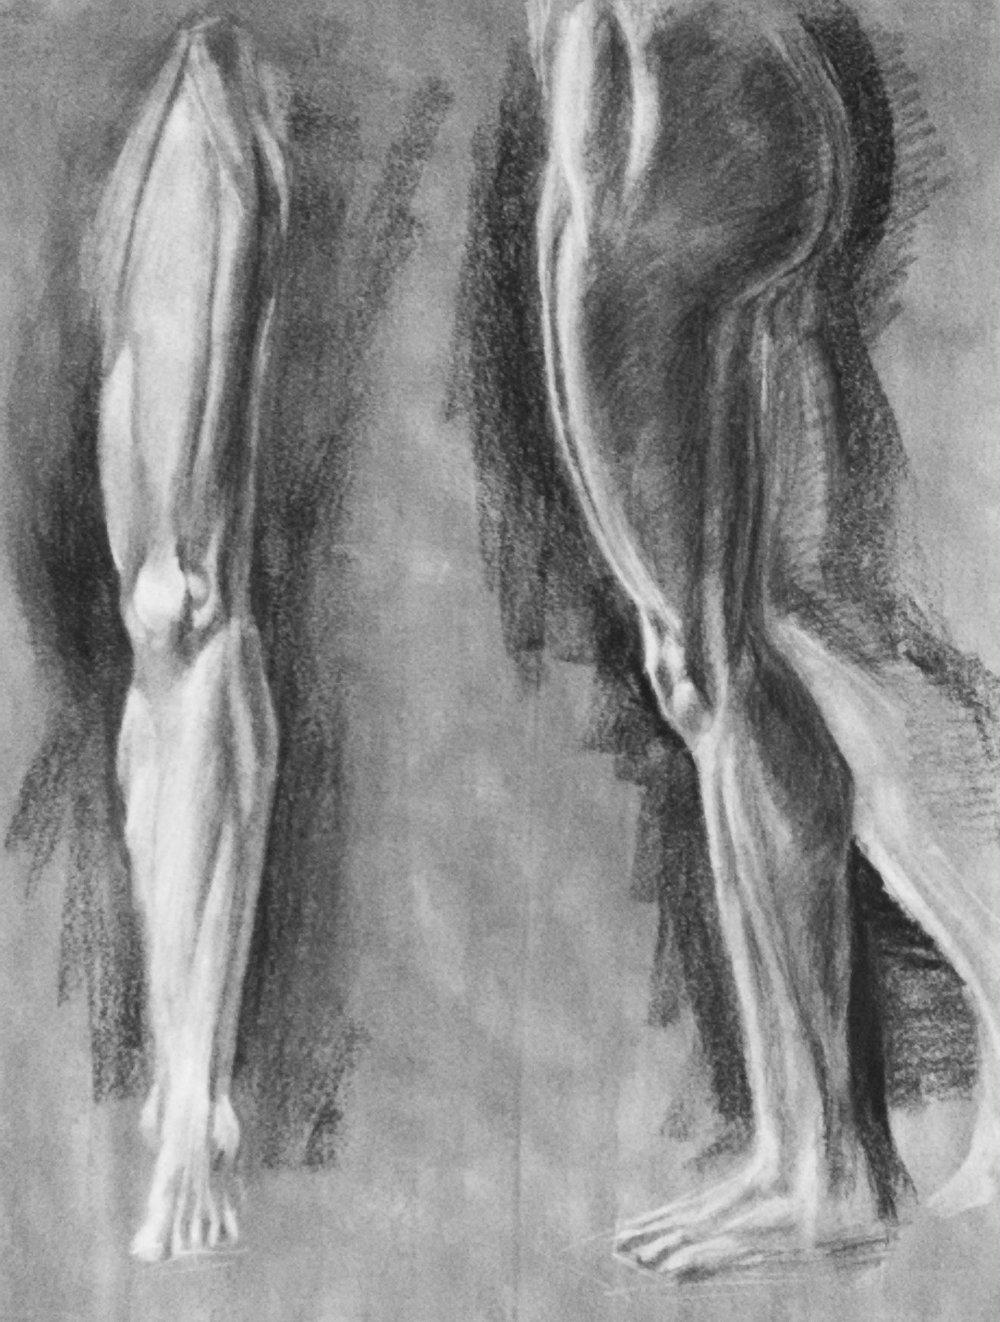 Leg Muscle Study  Charcoal 2014